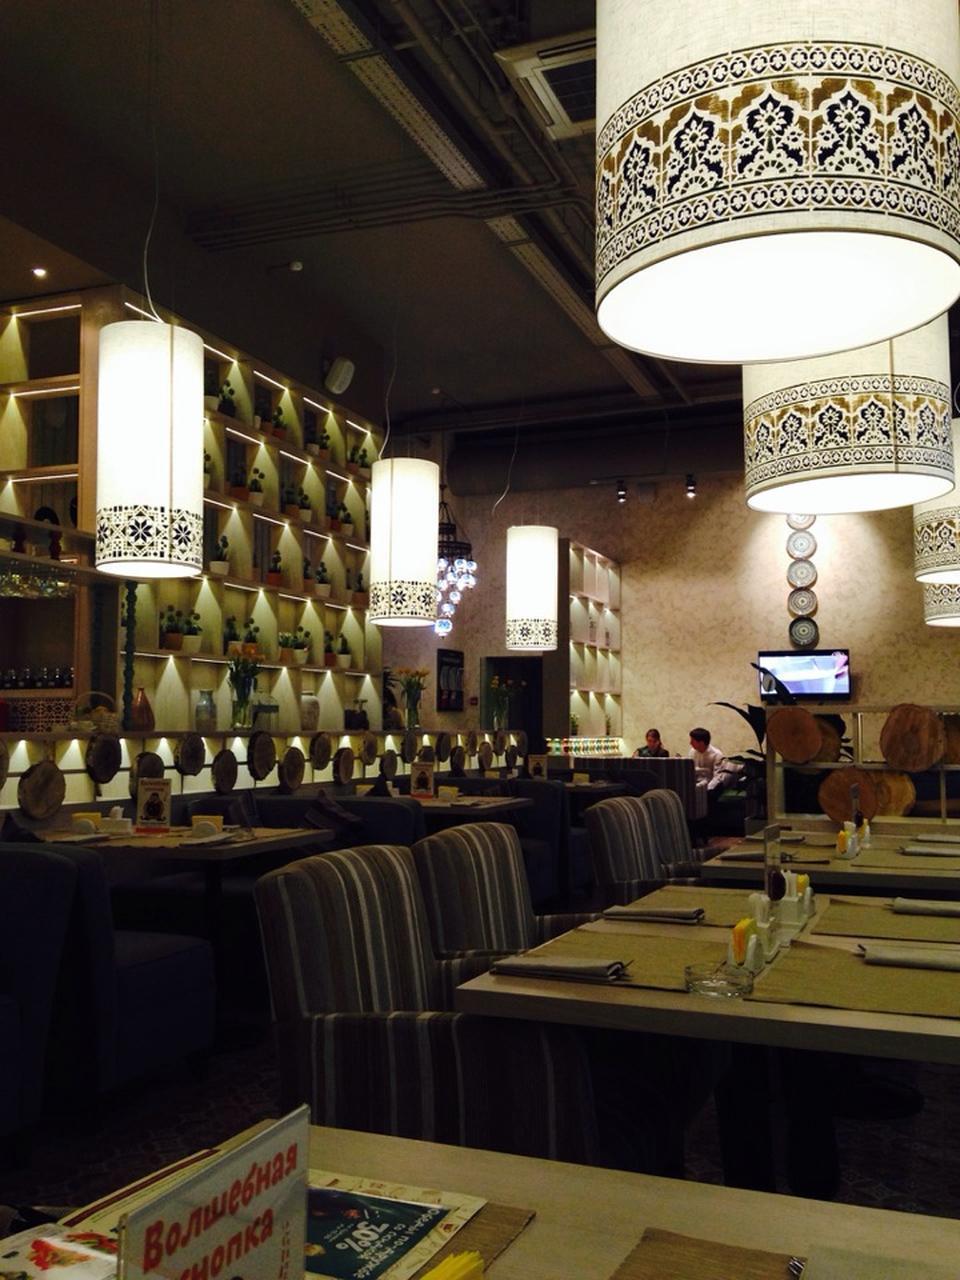 Восточное Кафе Лепешка в Королеве фото 28